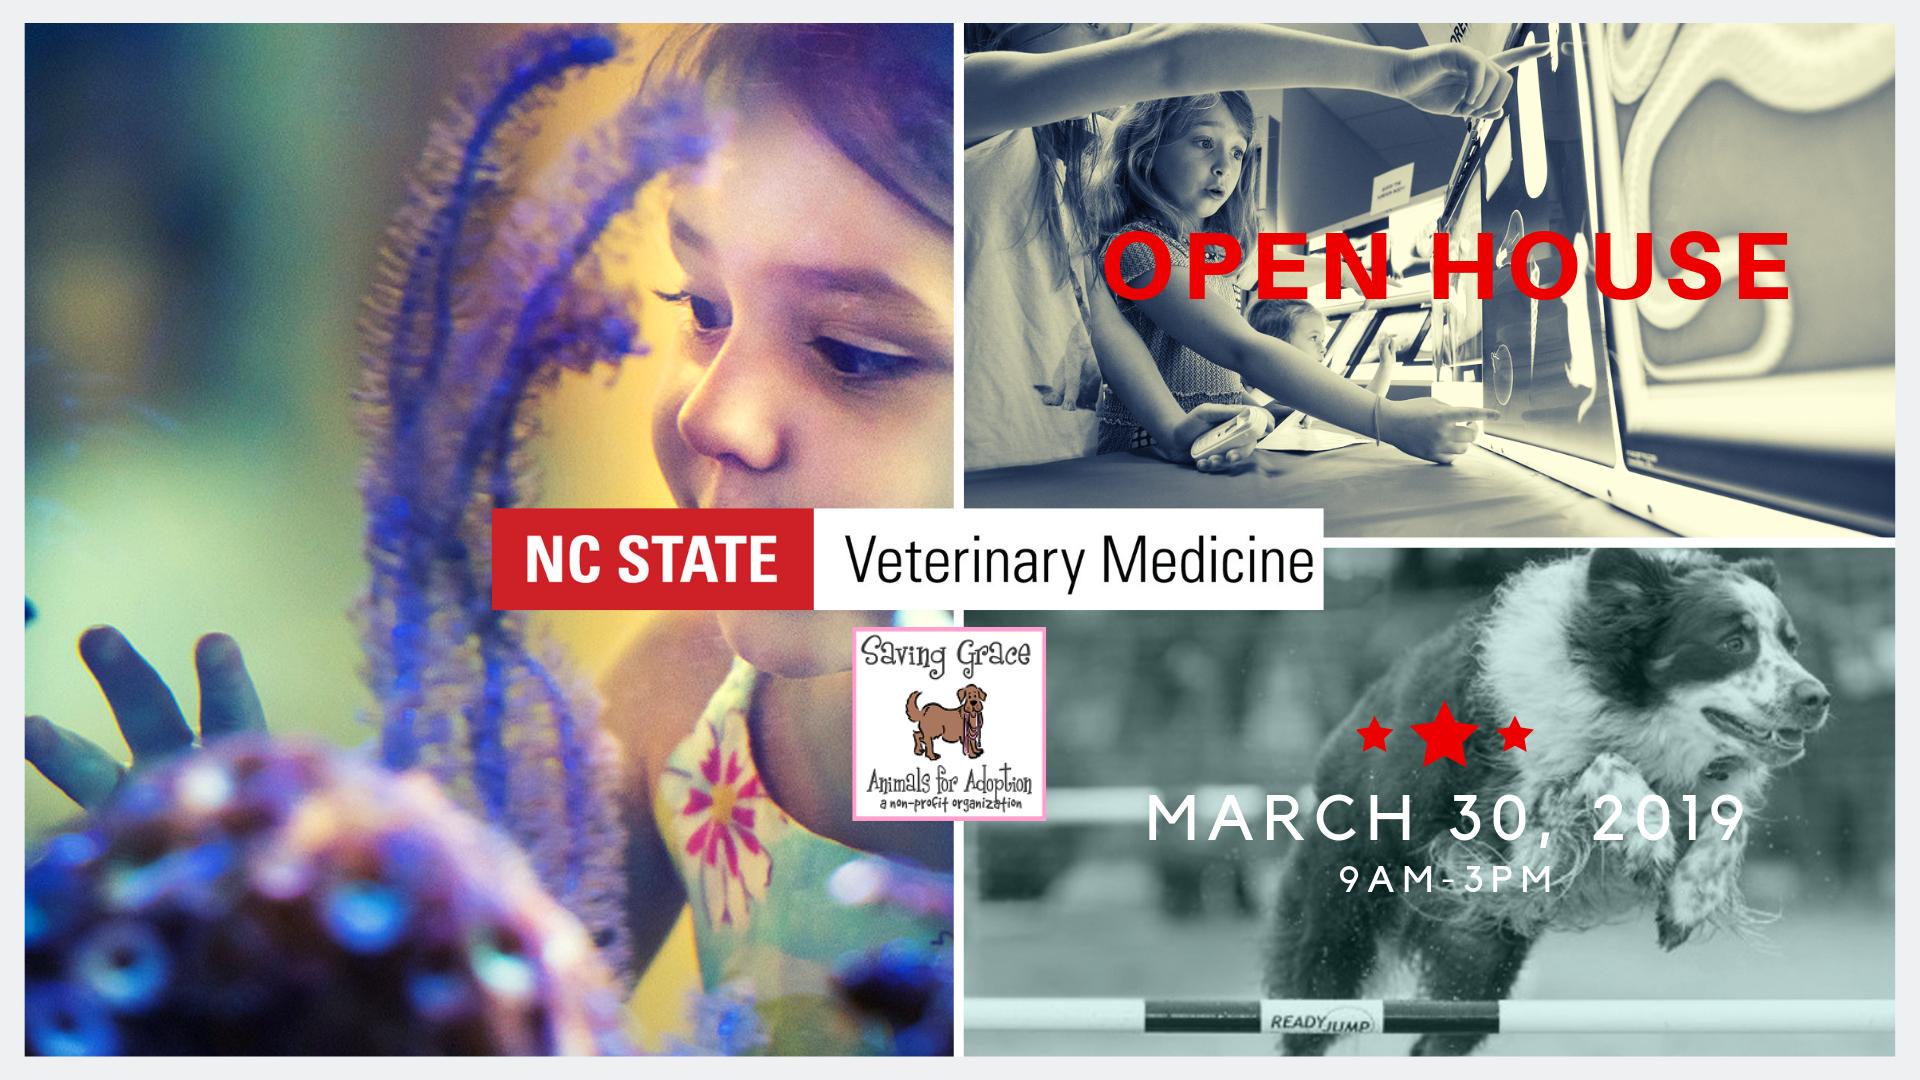 Nc State Veterinary Medicine Open House | Saving Grace Calendar 2019 Ncsu